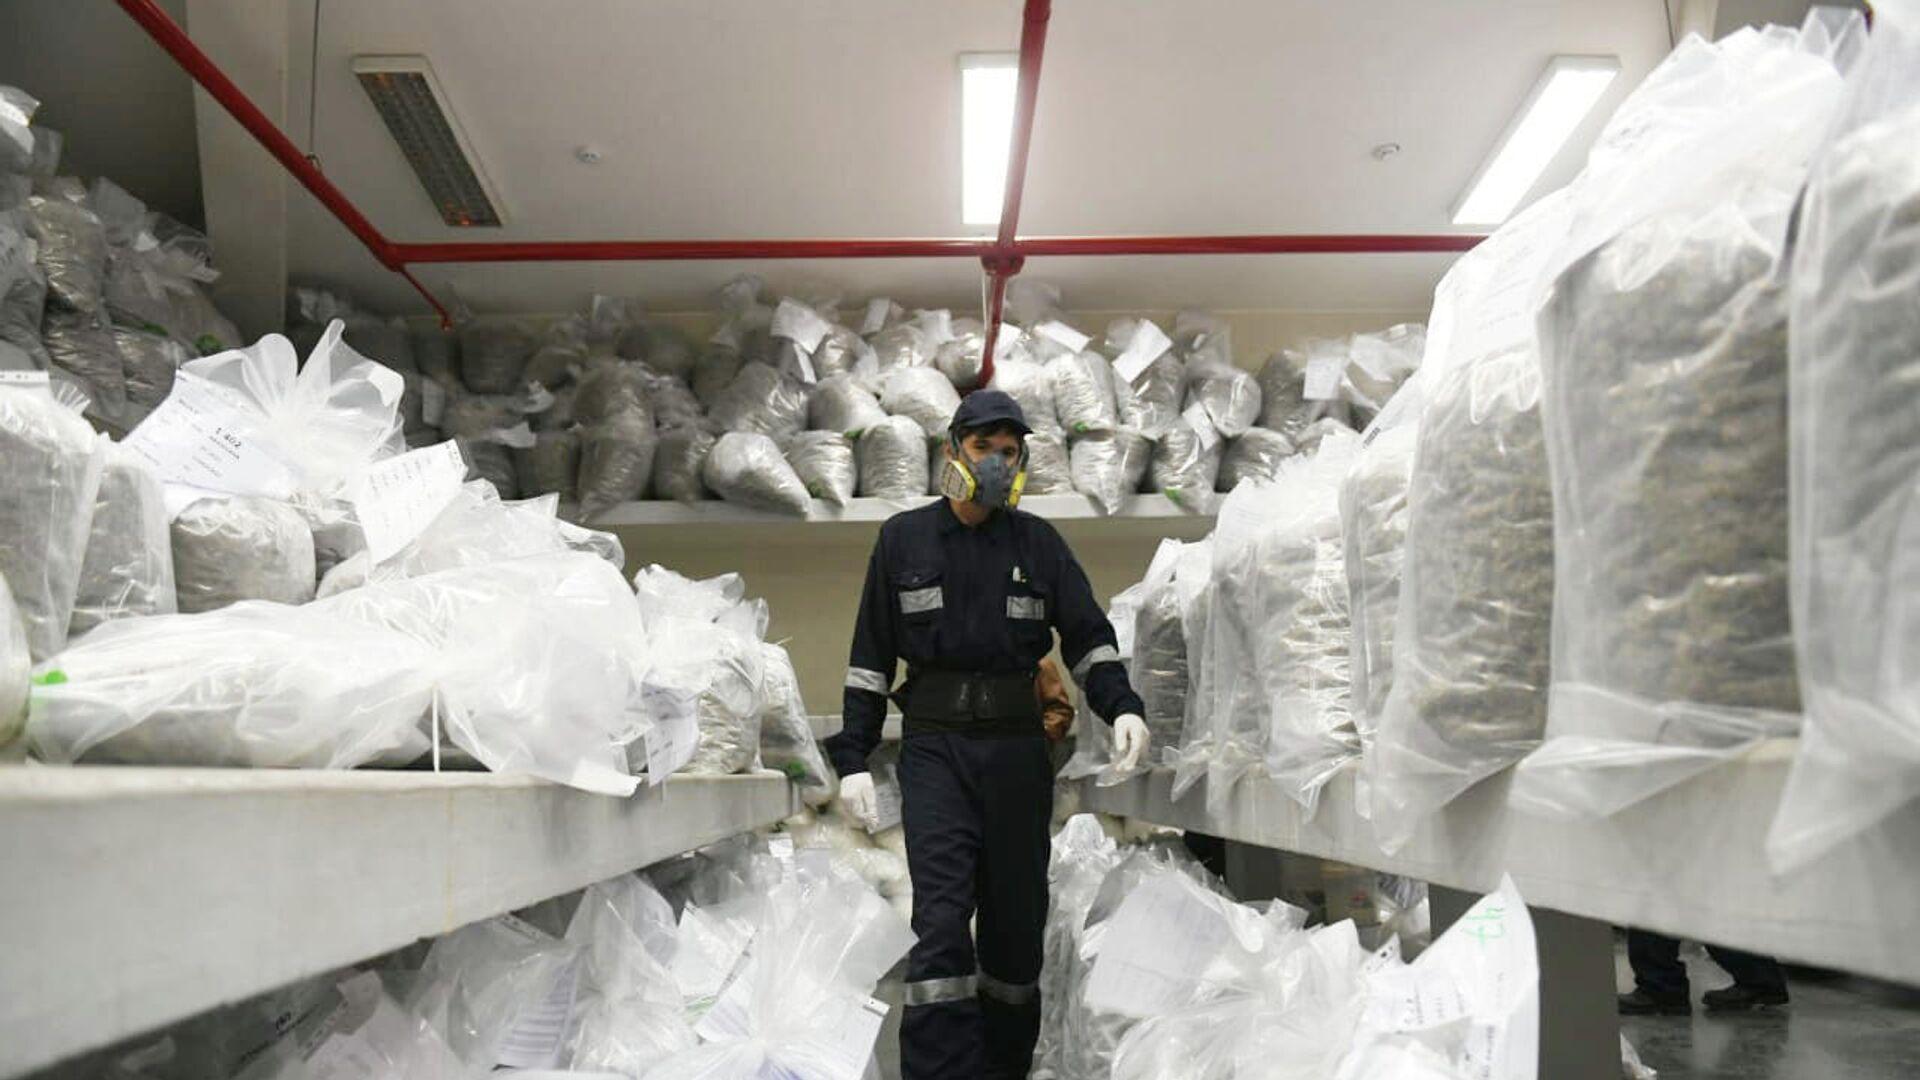 Drogas incautadas por la Policía de Perú - Sputnik Mundo, 1920, 15.09.2021